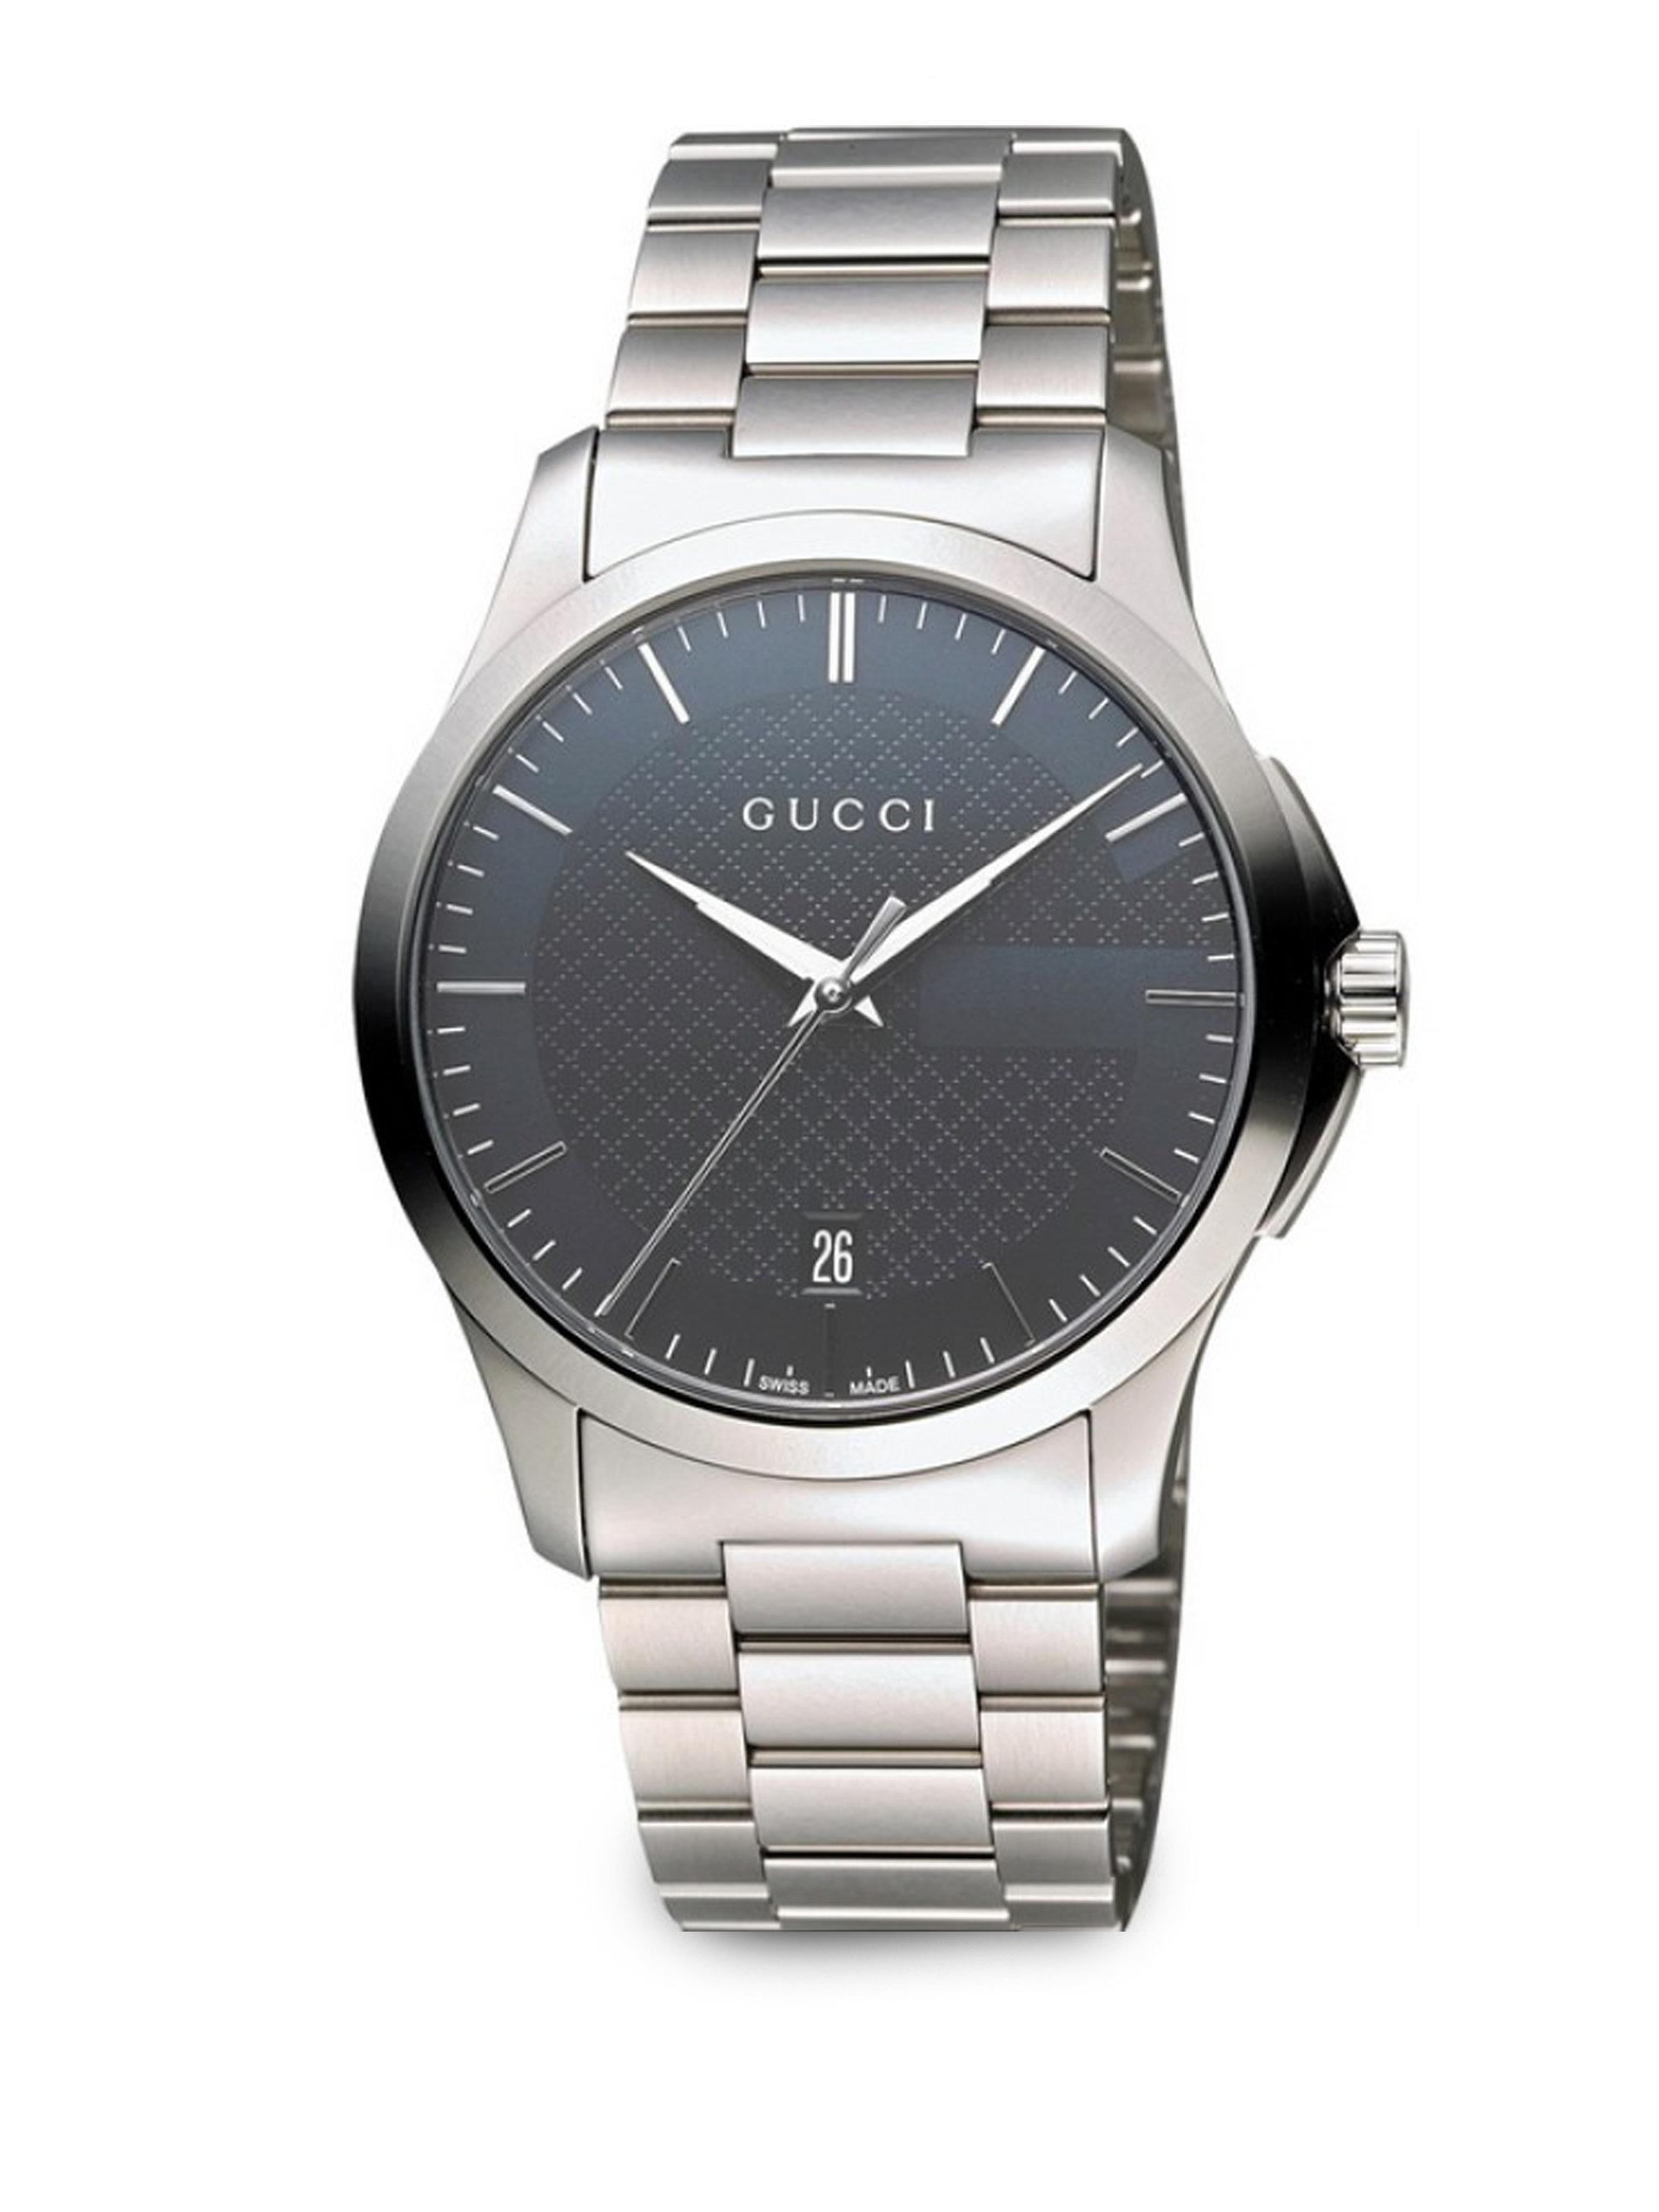 61c888f455b Lyst - Gucci Unisex Swiss G-timeless Stainless Steel Bracelet Watch ...